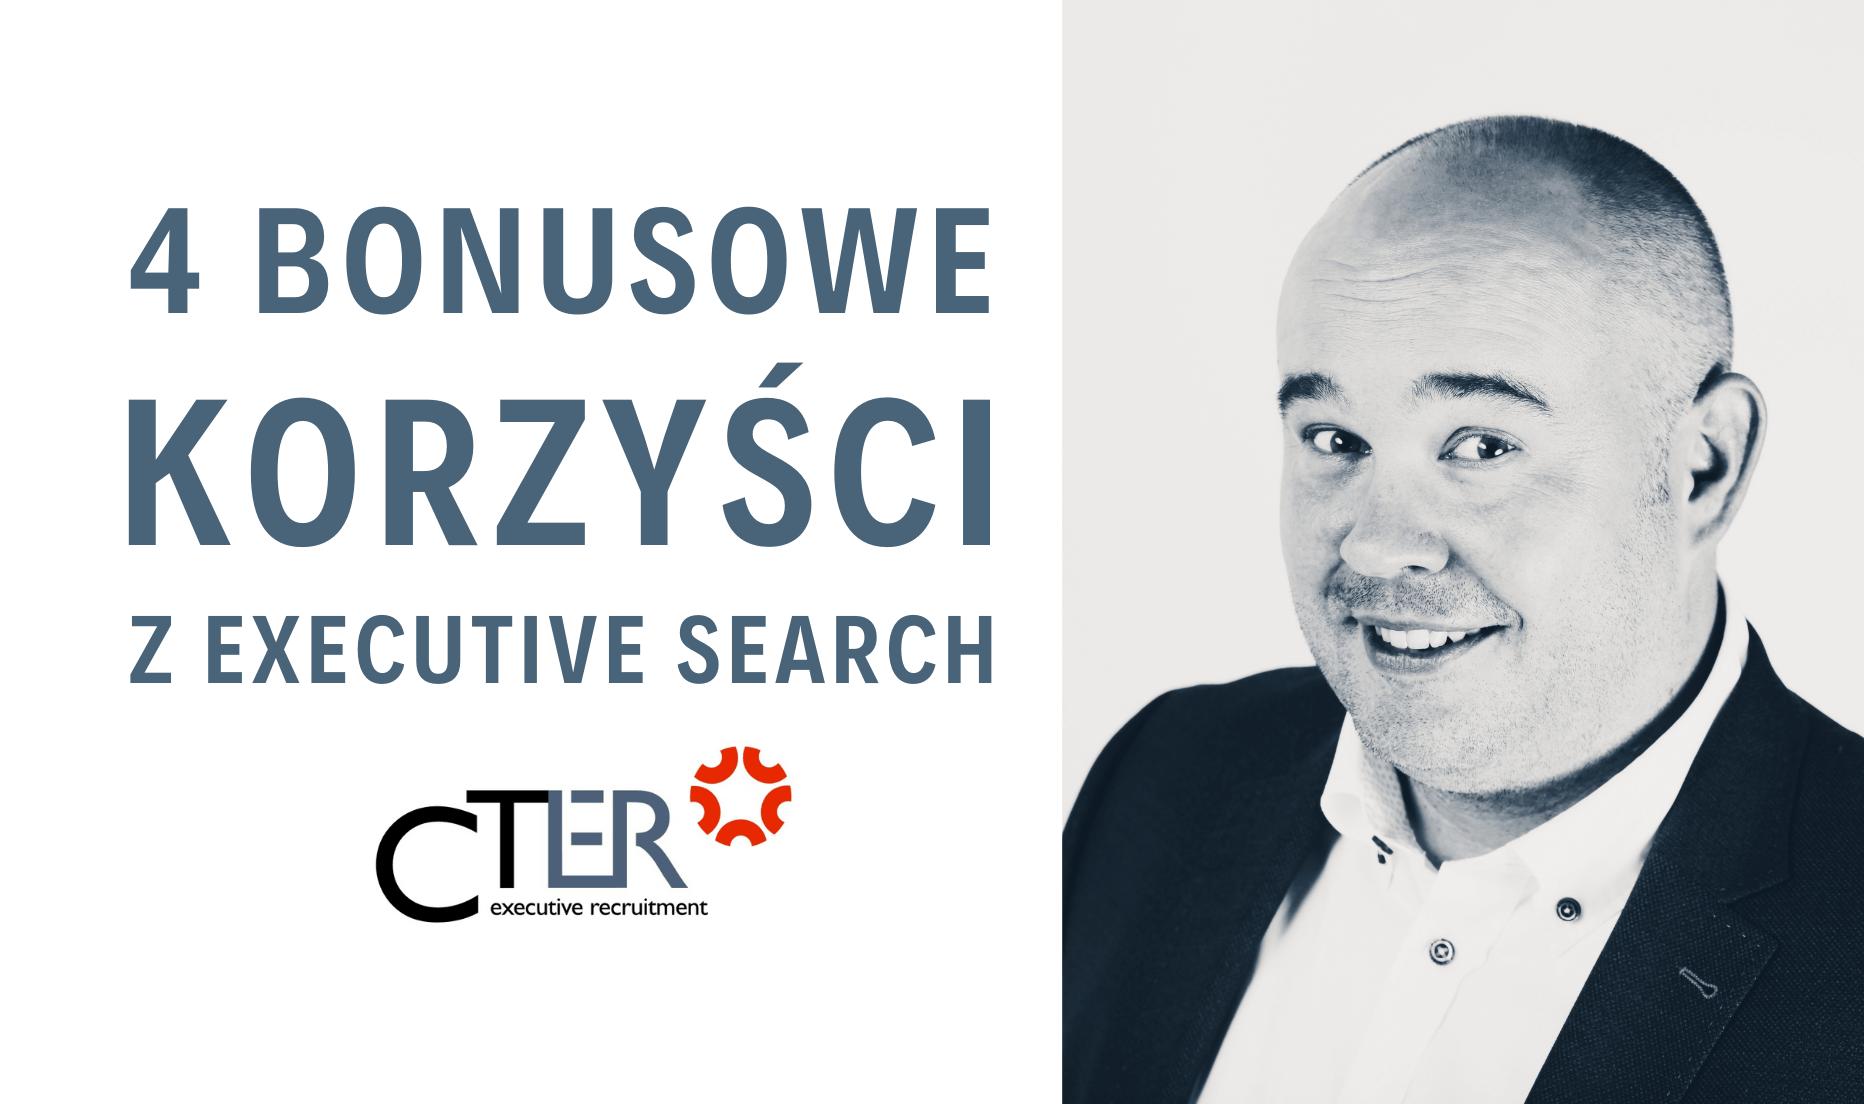 executive search korzysci